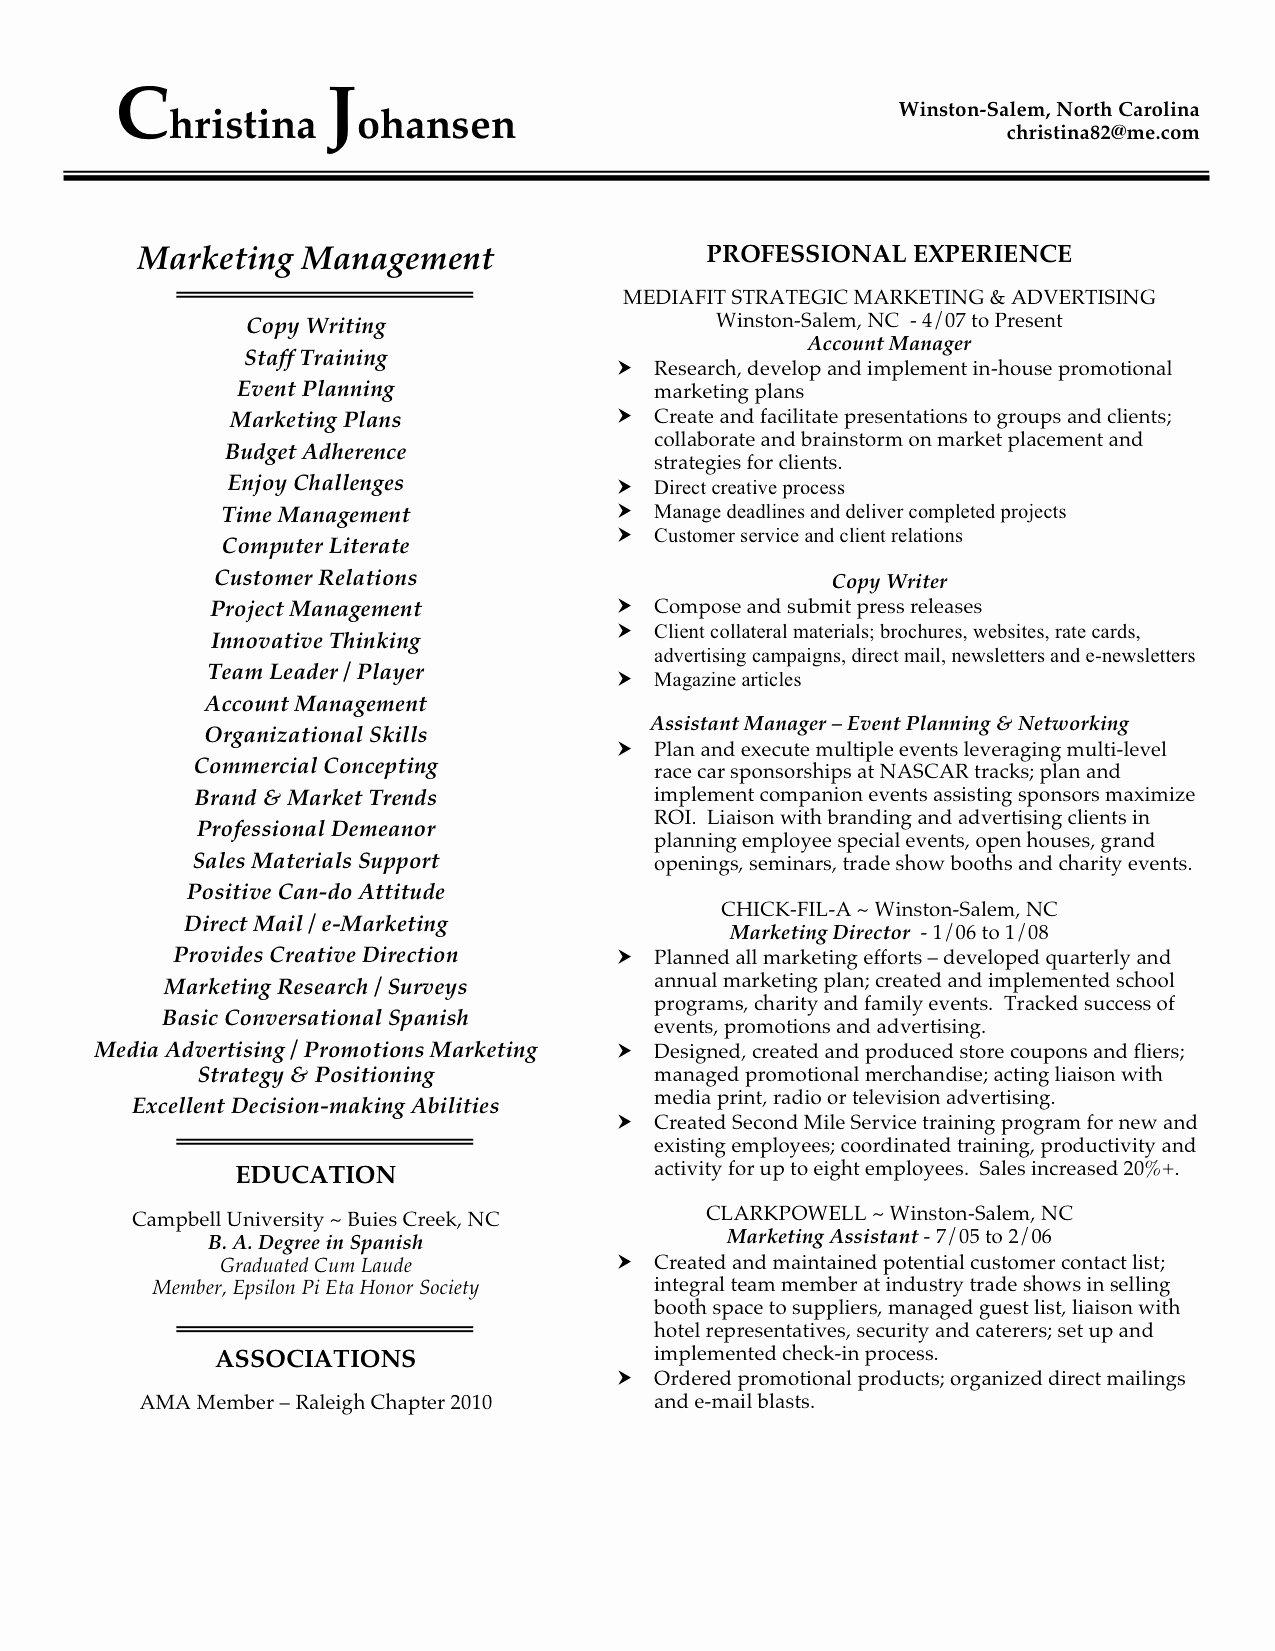 Resume Samp Supply Chain Management Resume Objective Nice